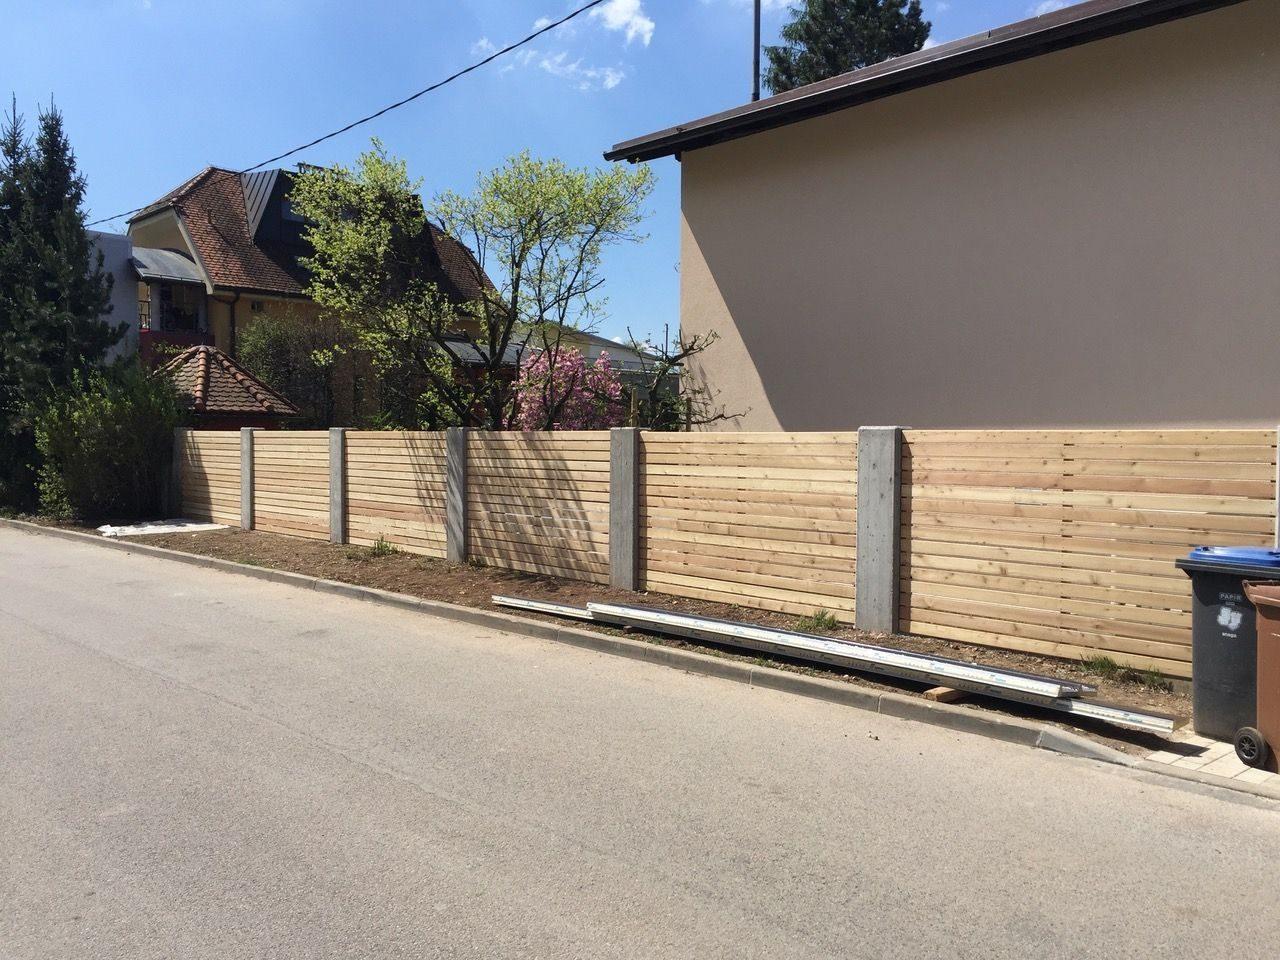 sibirski-macesen-lesene-terase-lesene-fasade-pd-les.si-112